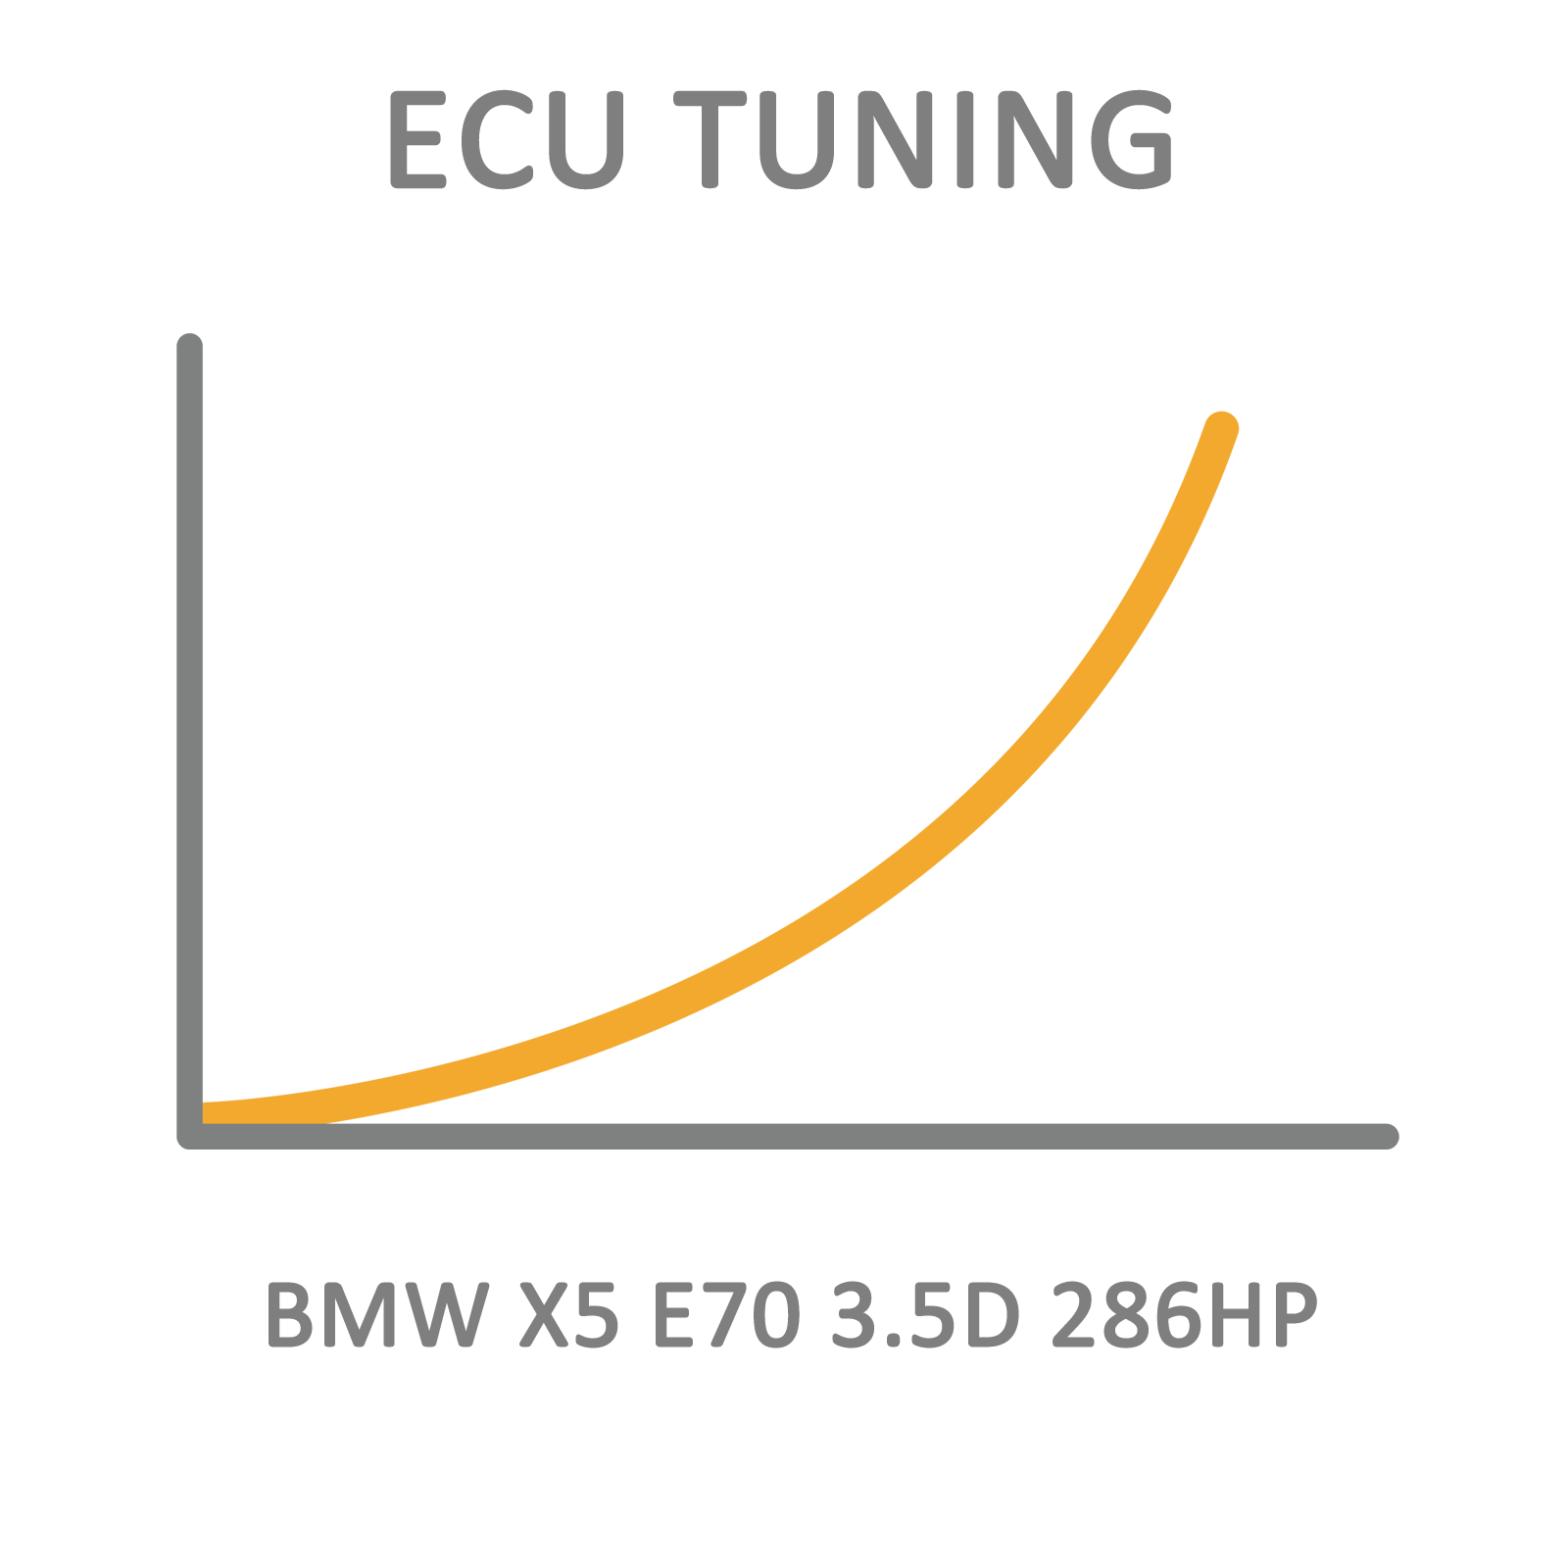 BMW X5 E70 3.5D 286HP ECU Tuning Remapping Programming